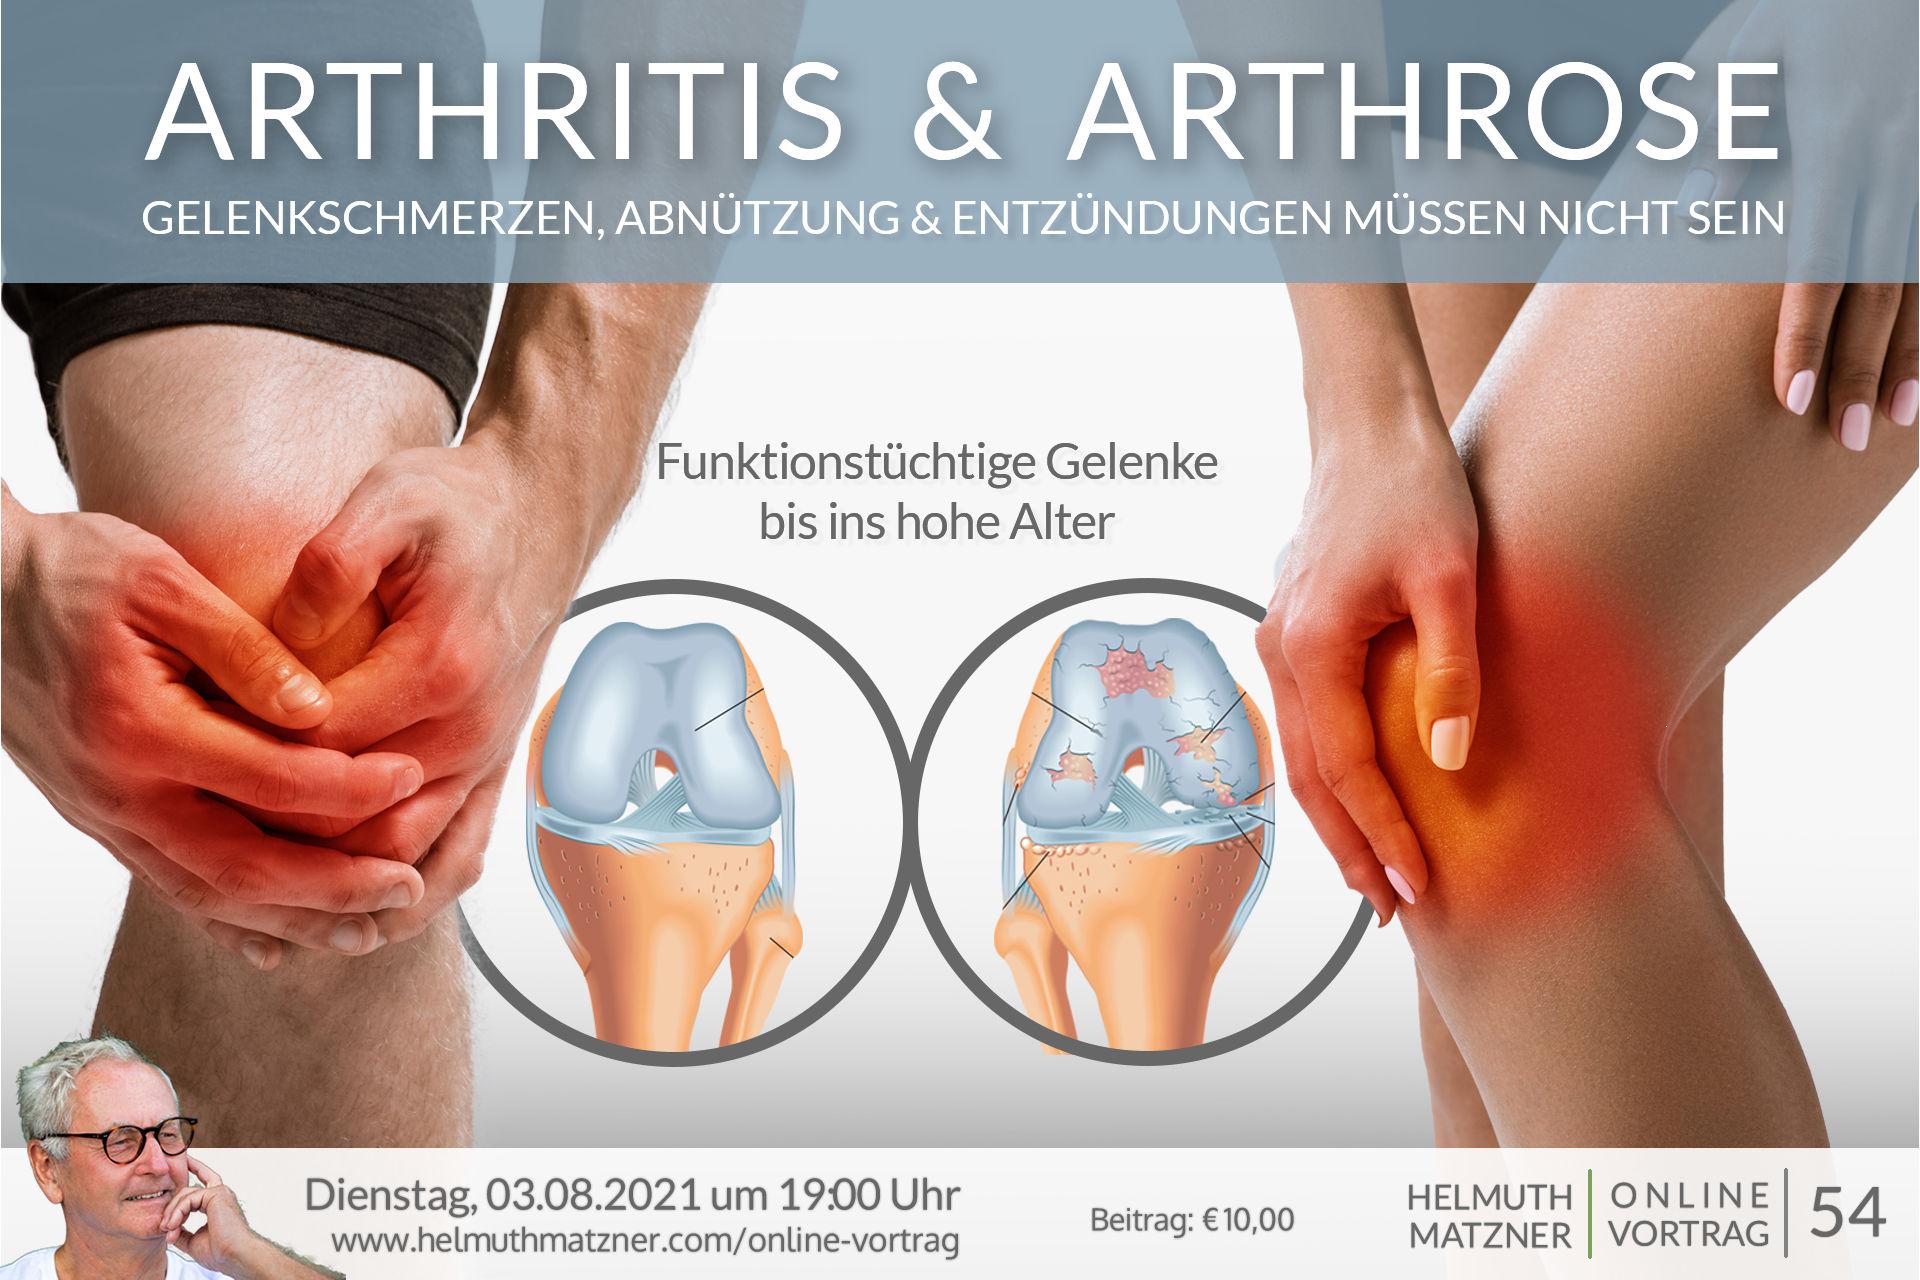 Helmuth Matzner - Online-Vortrag 54 - Arthritis Arthrose - OV Banner v01